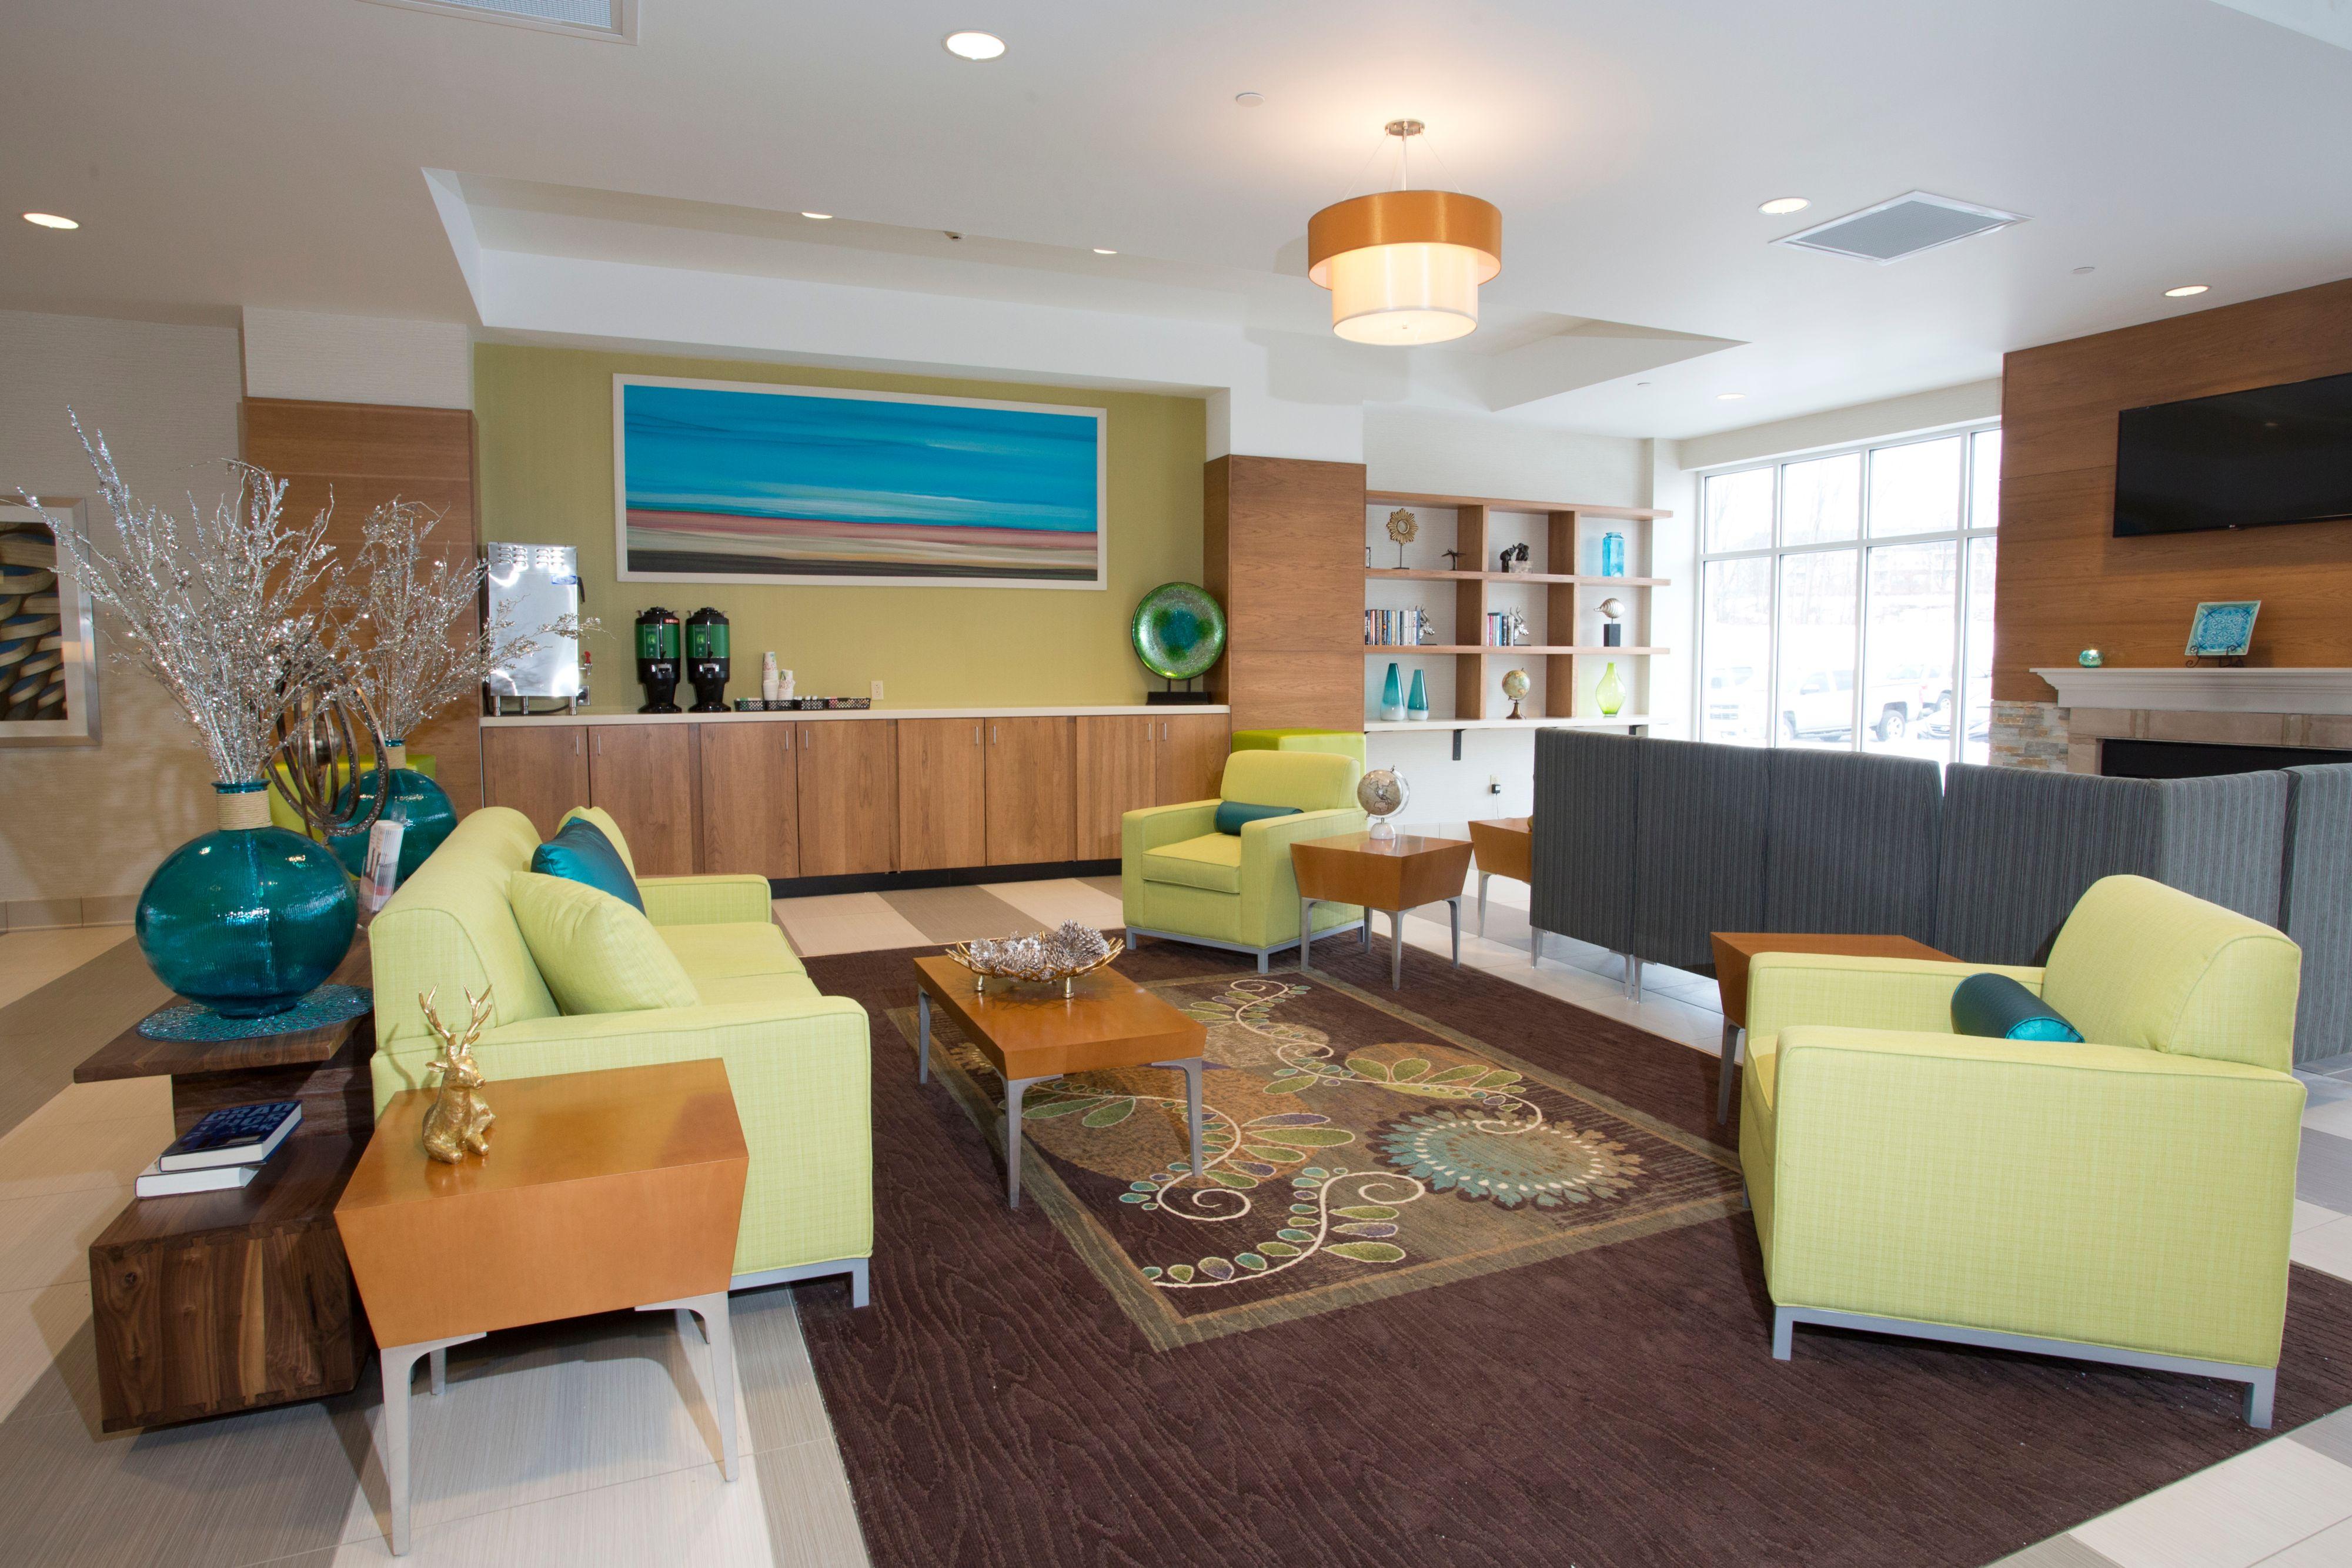 Holiday Inn Morgantown - University Area image 5